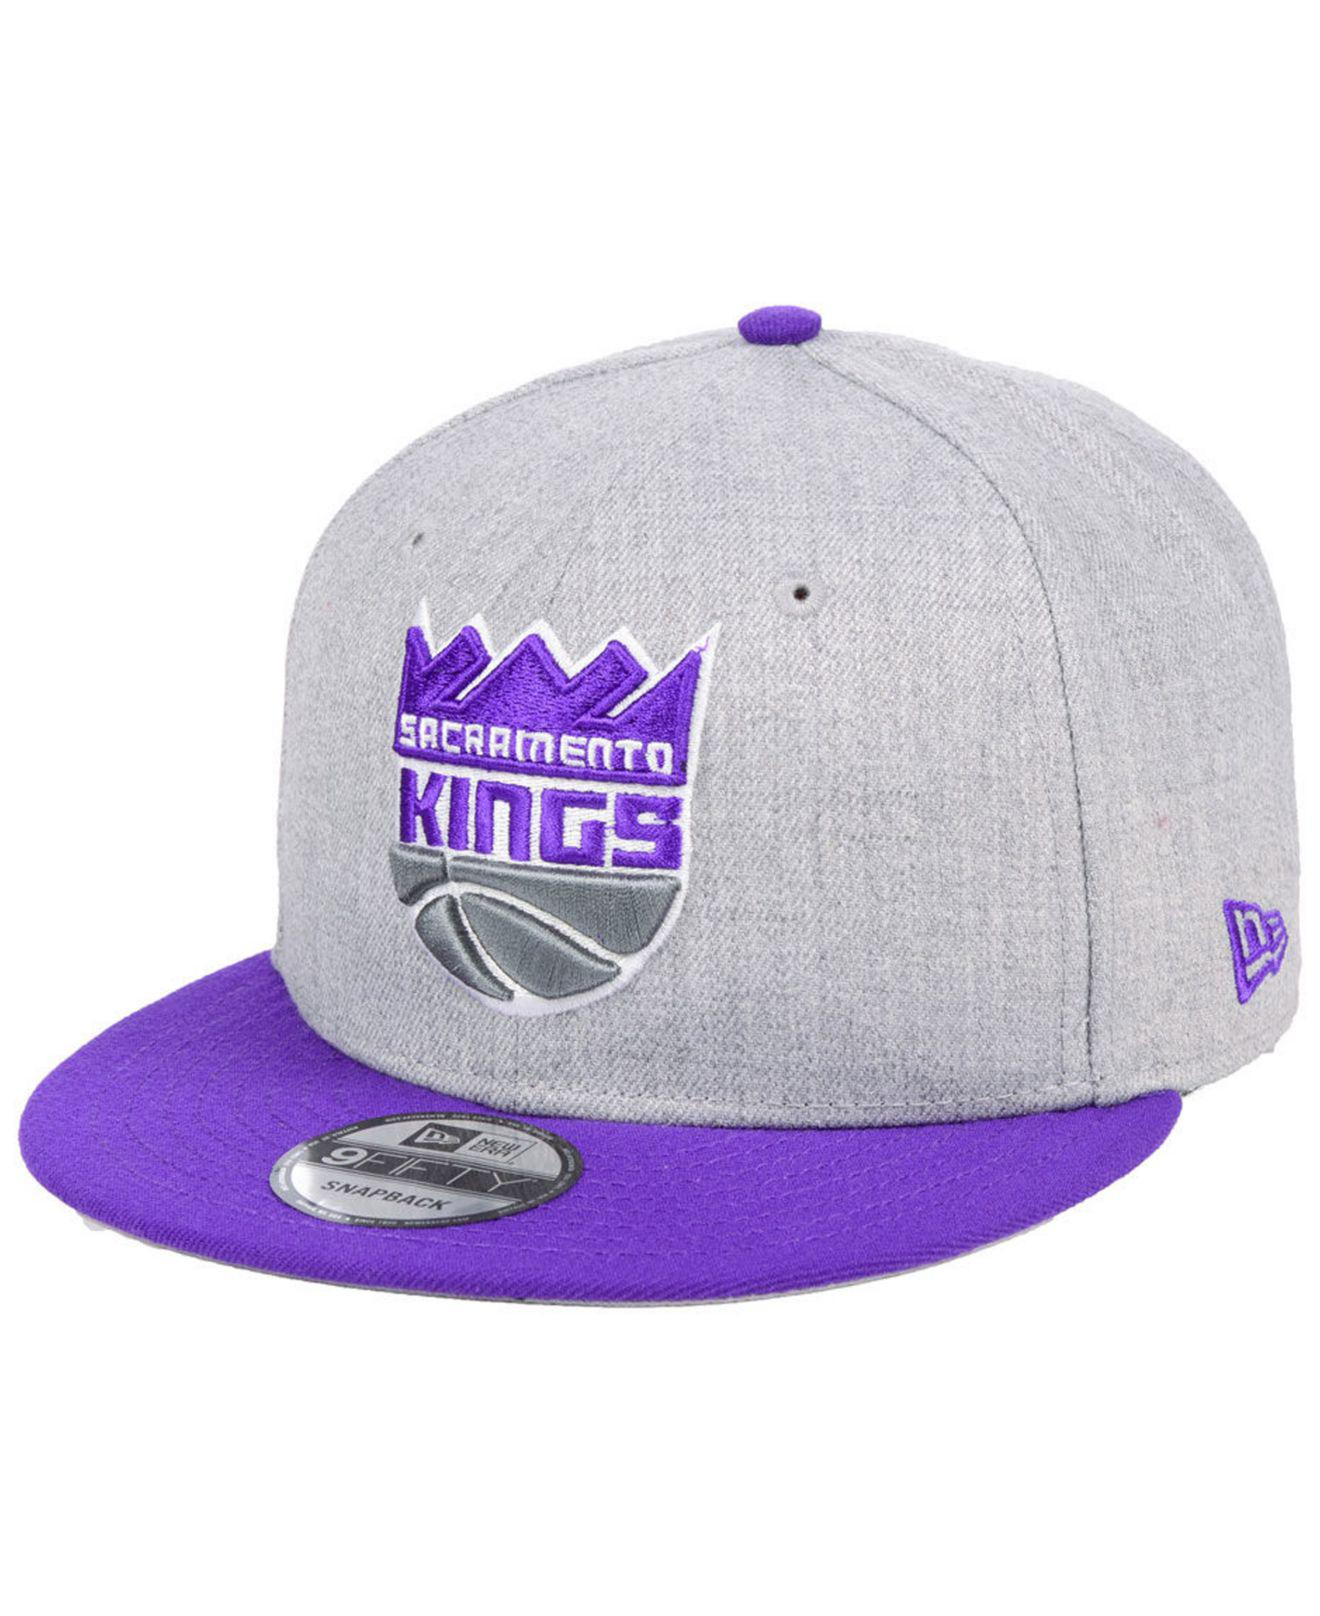 timeless design 0b981 03a37 ... where to buy ktz. purple sacramento kings heather gray 9fifty snapback  cap 0615d 9d0fb